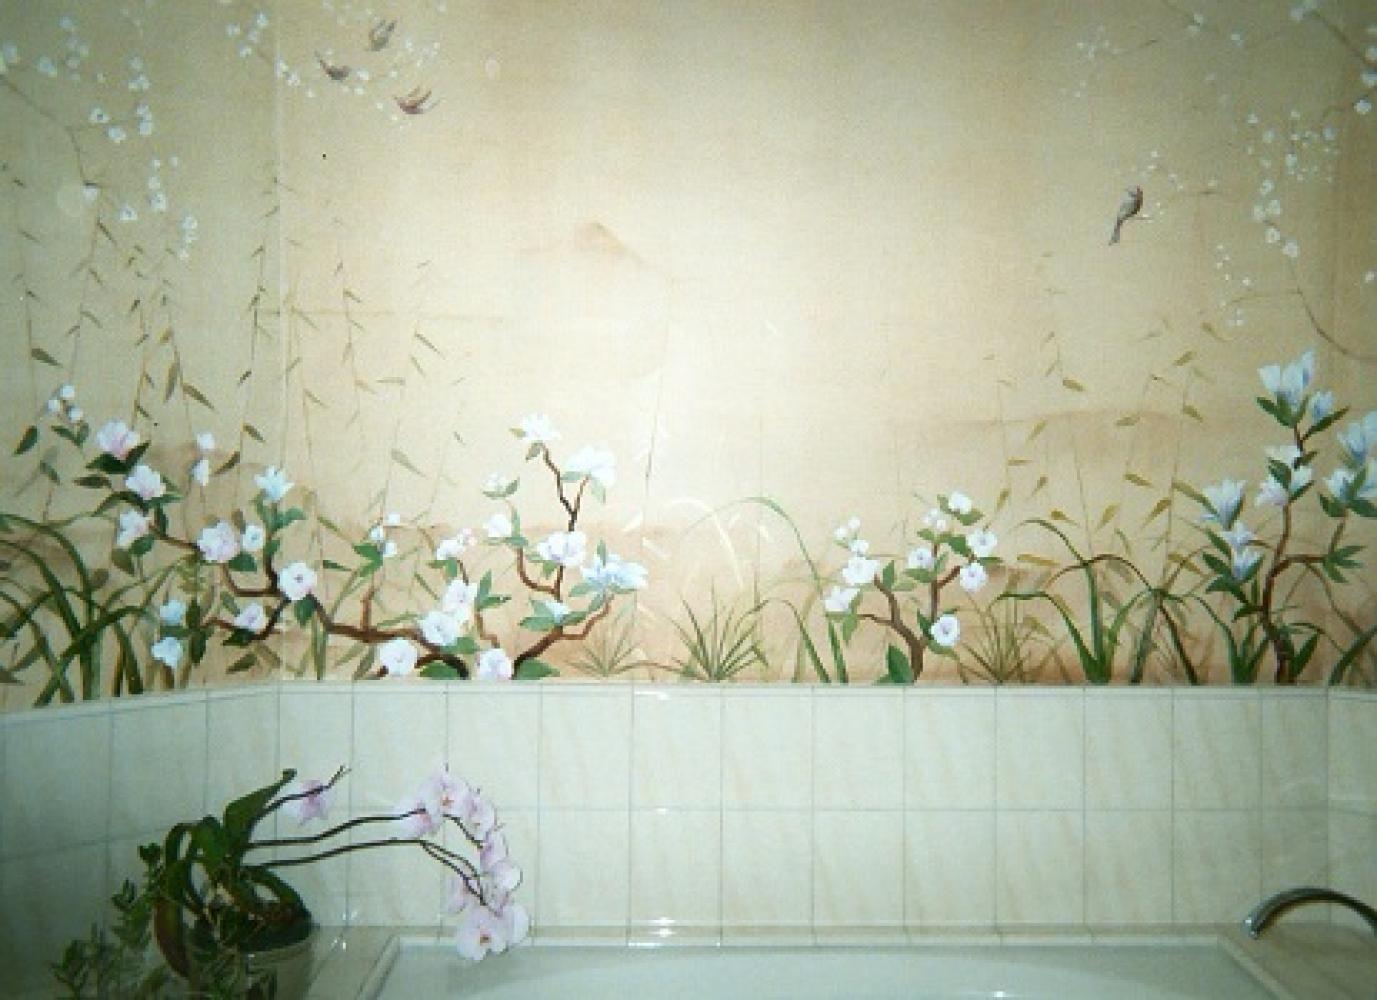 Japanese Mural For A Bathroom. Hand Painted Bathroom Mural. By Alexandra  Pastorino